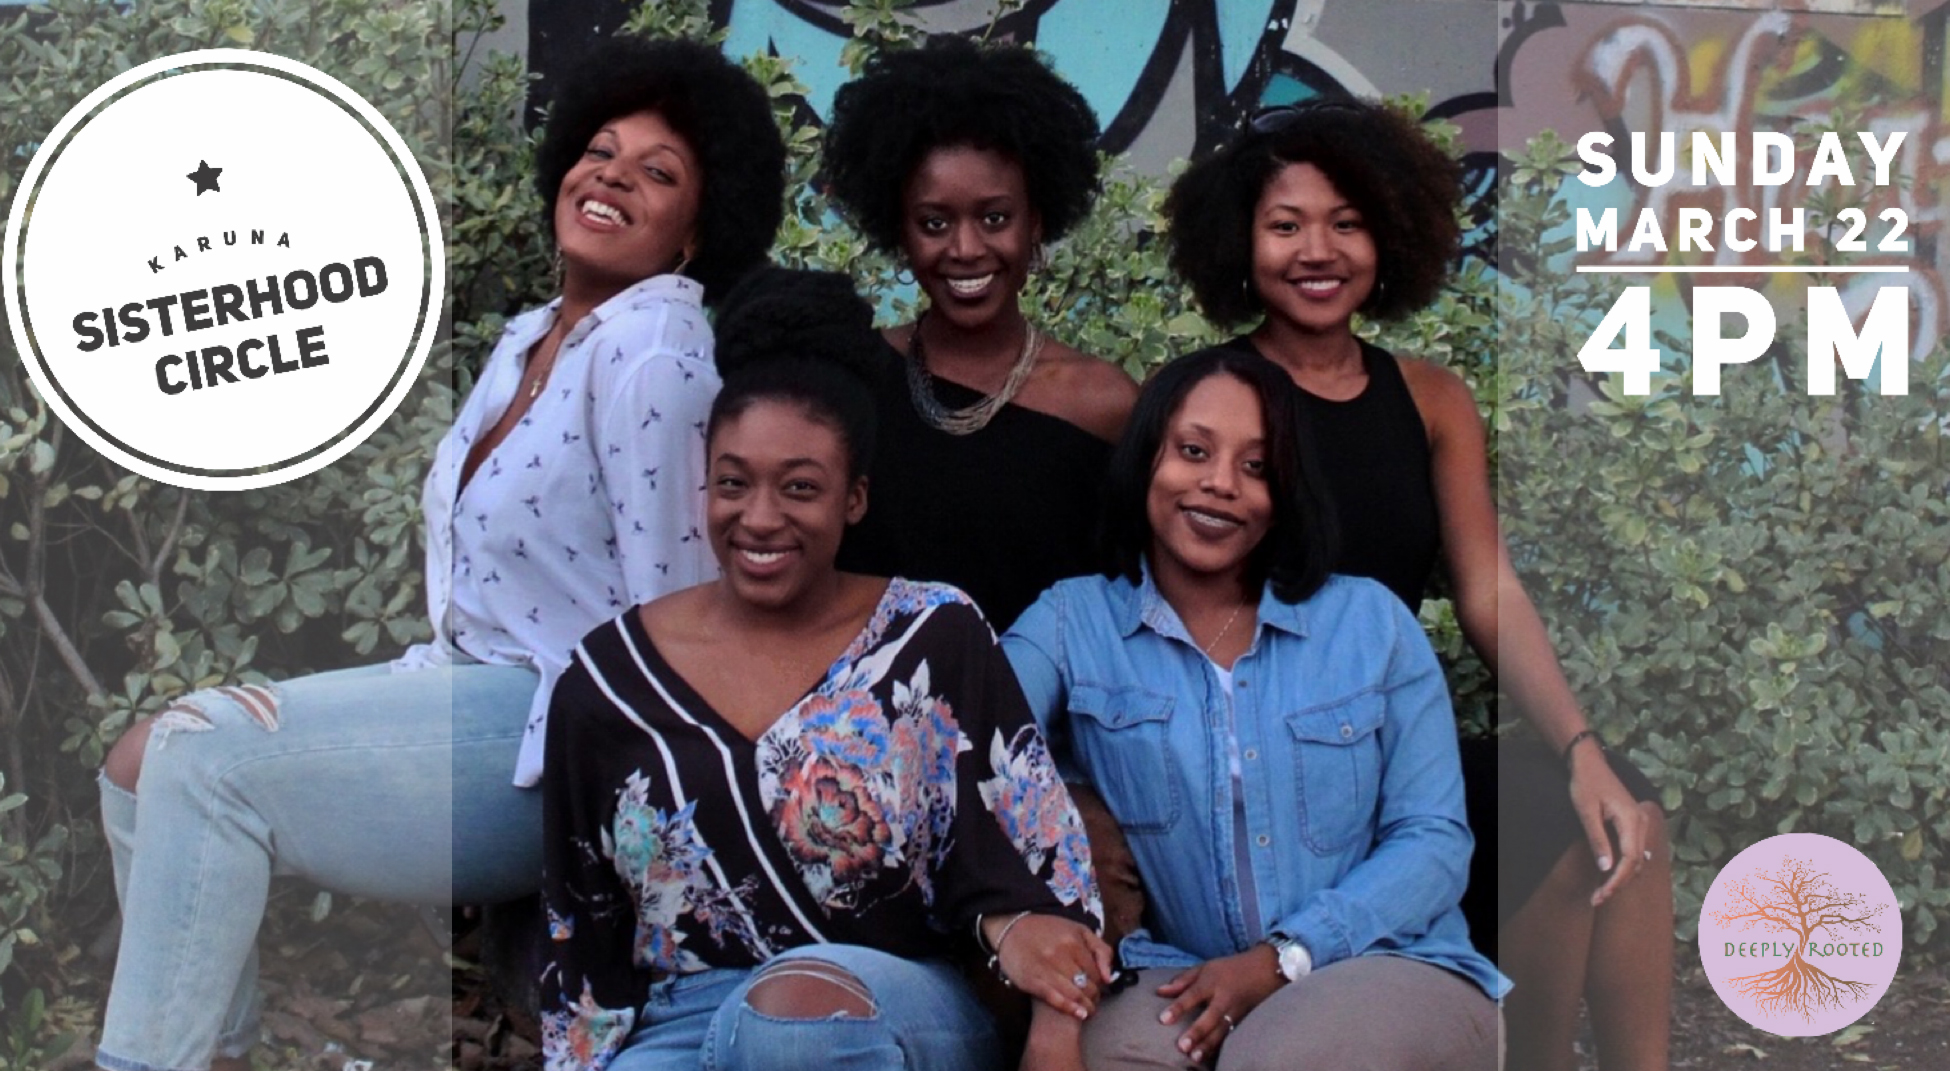 Karuna Sisterhood Circle